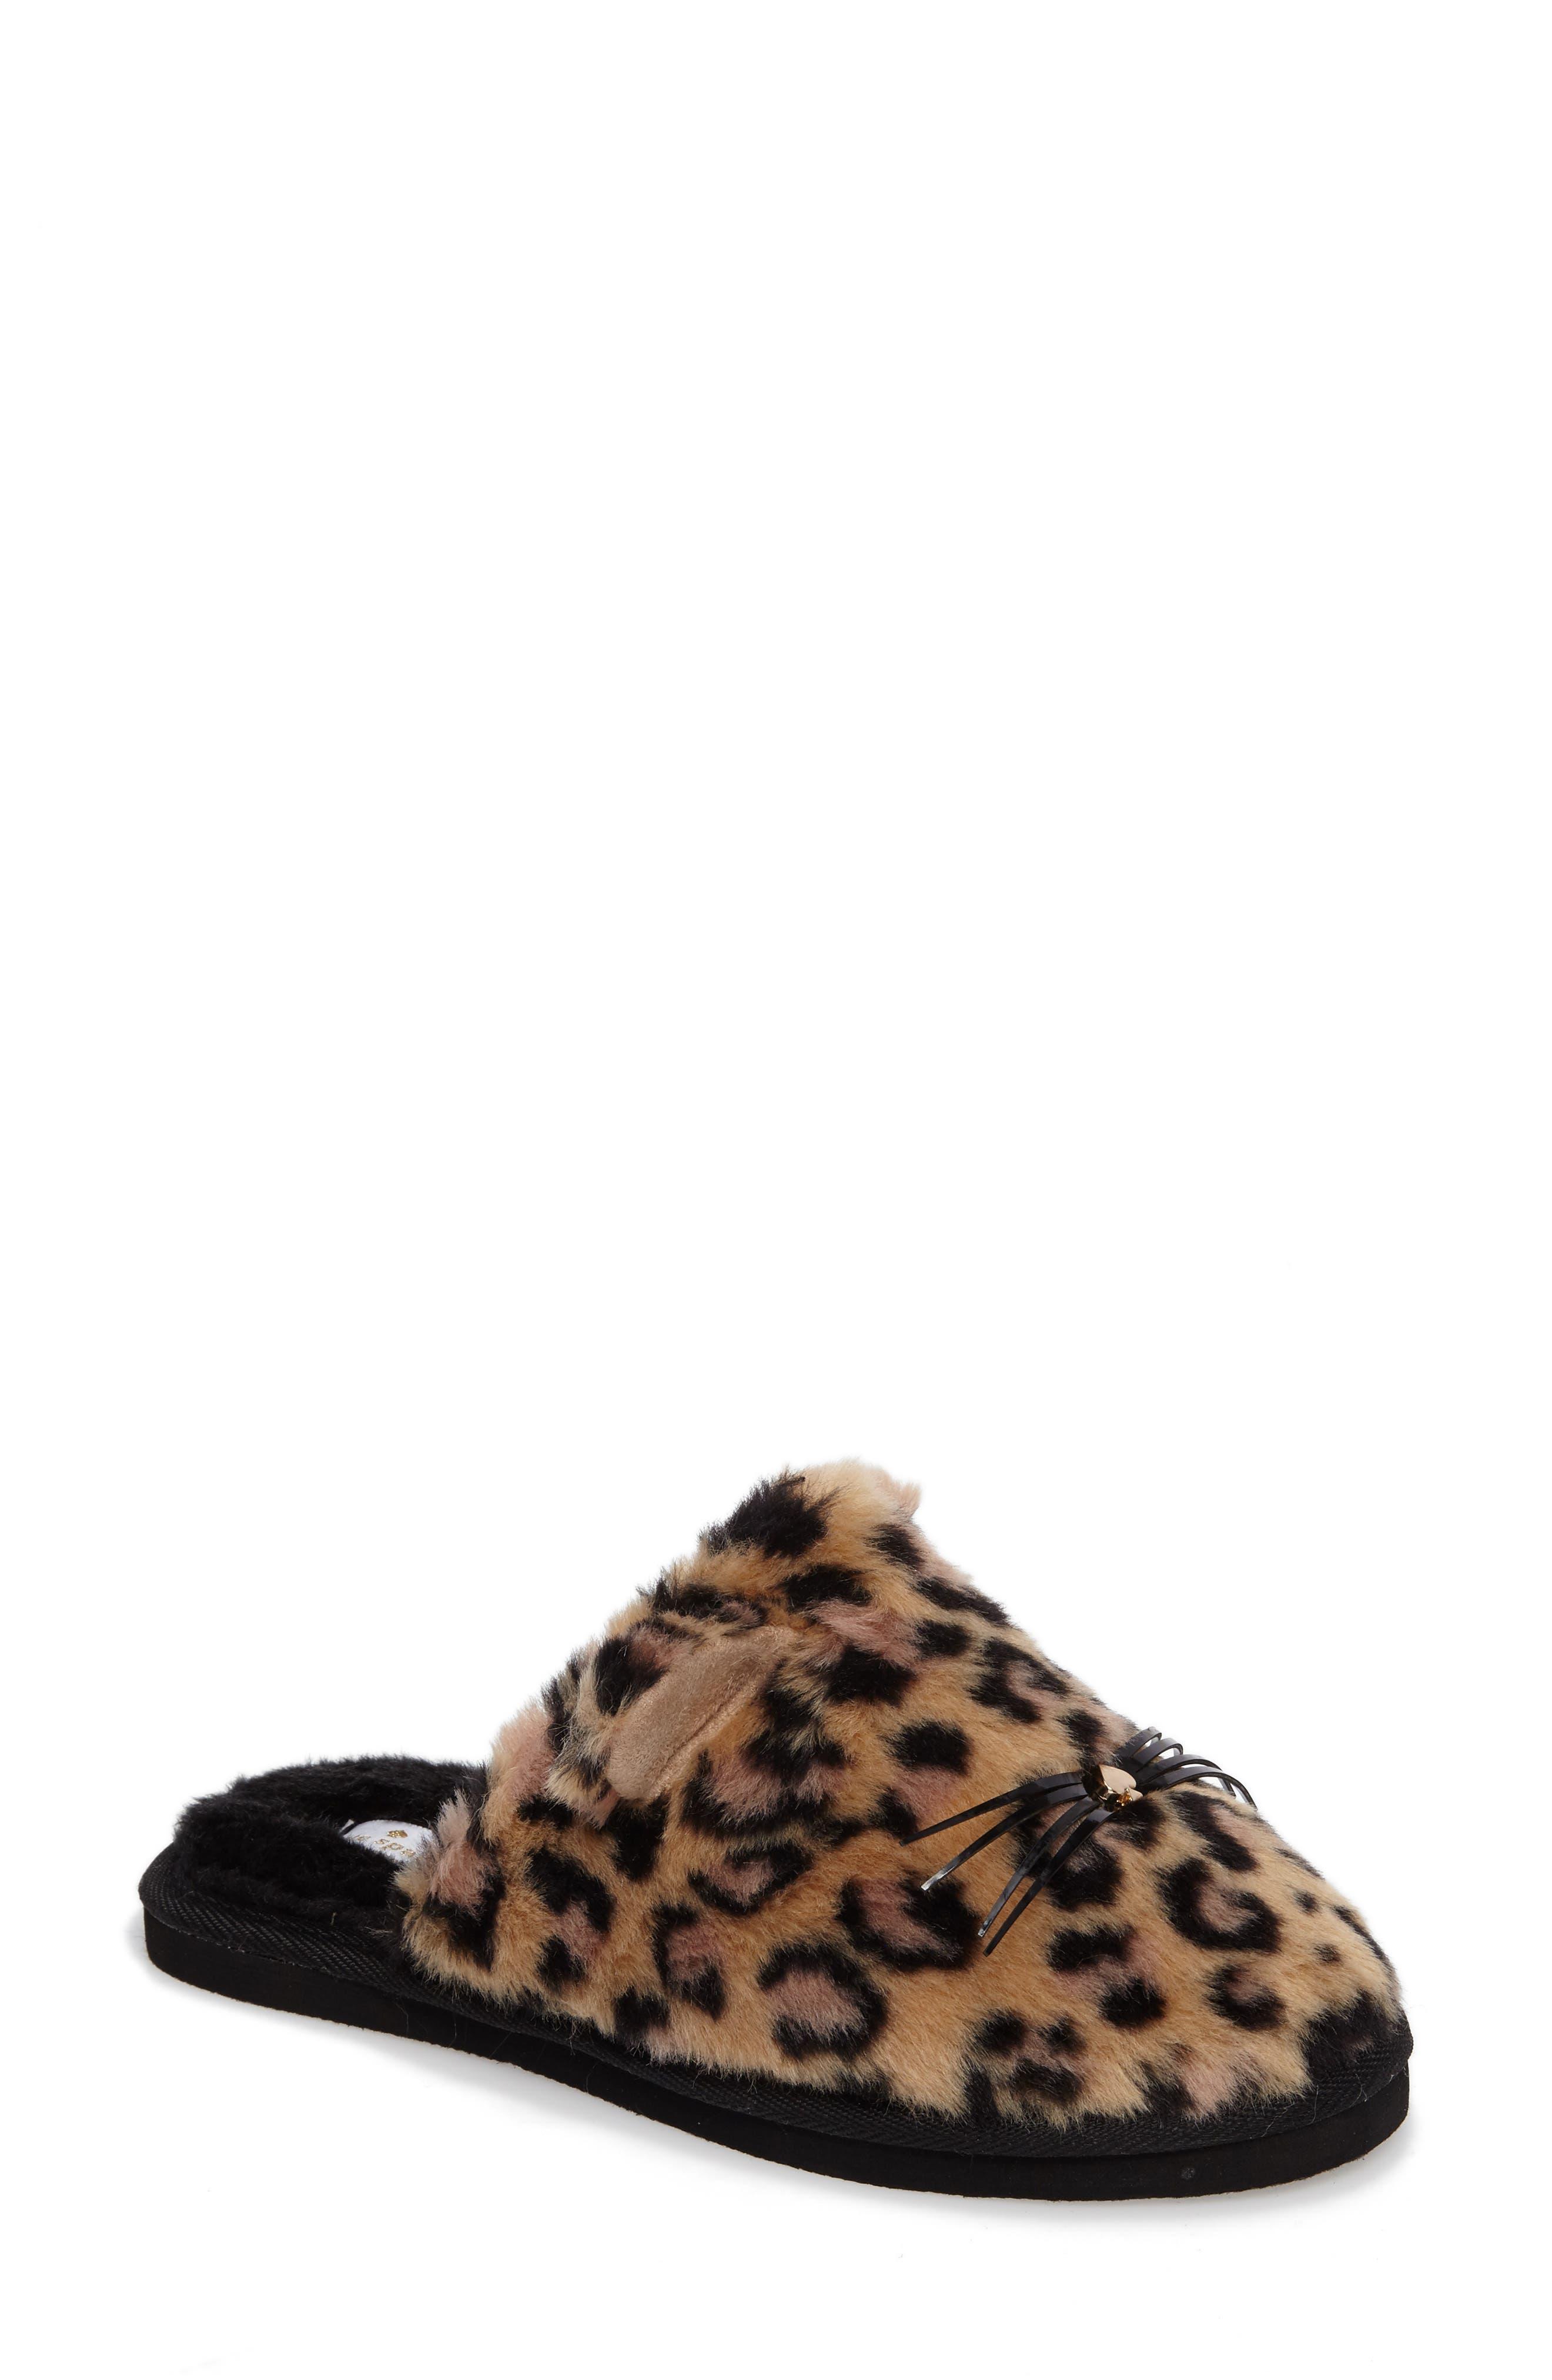 Main Image - kate spade new york belindy scuff slipper (Women)